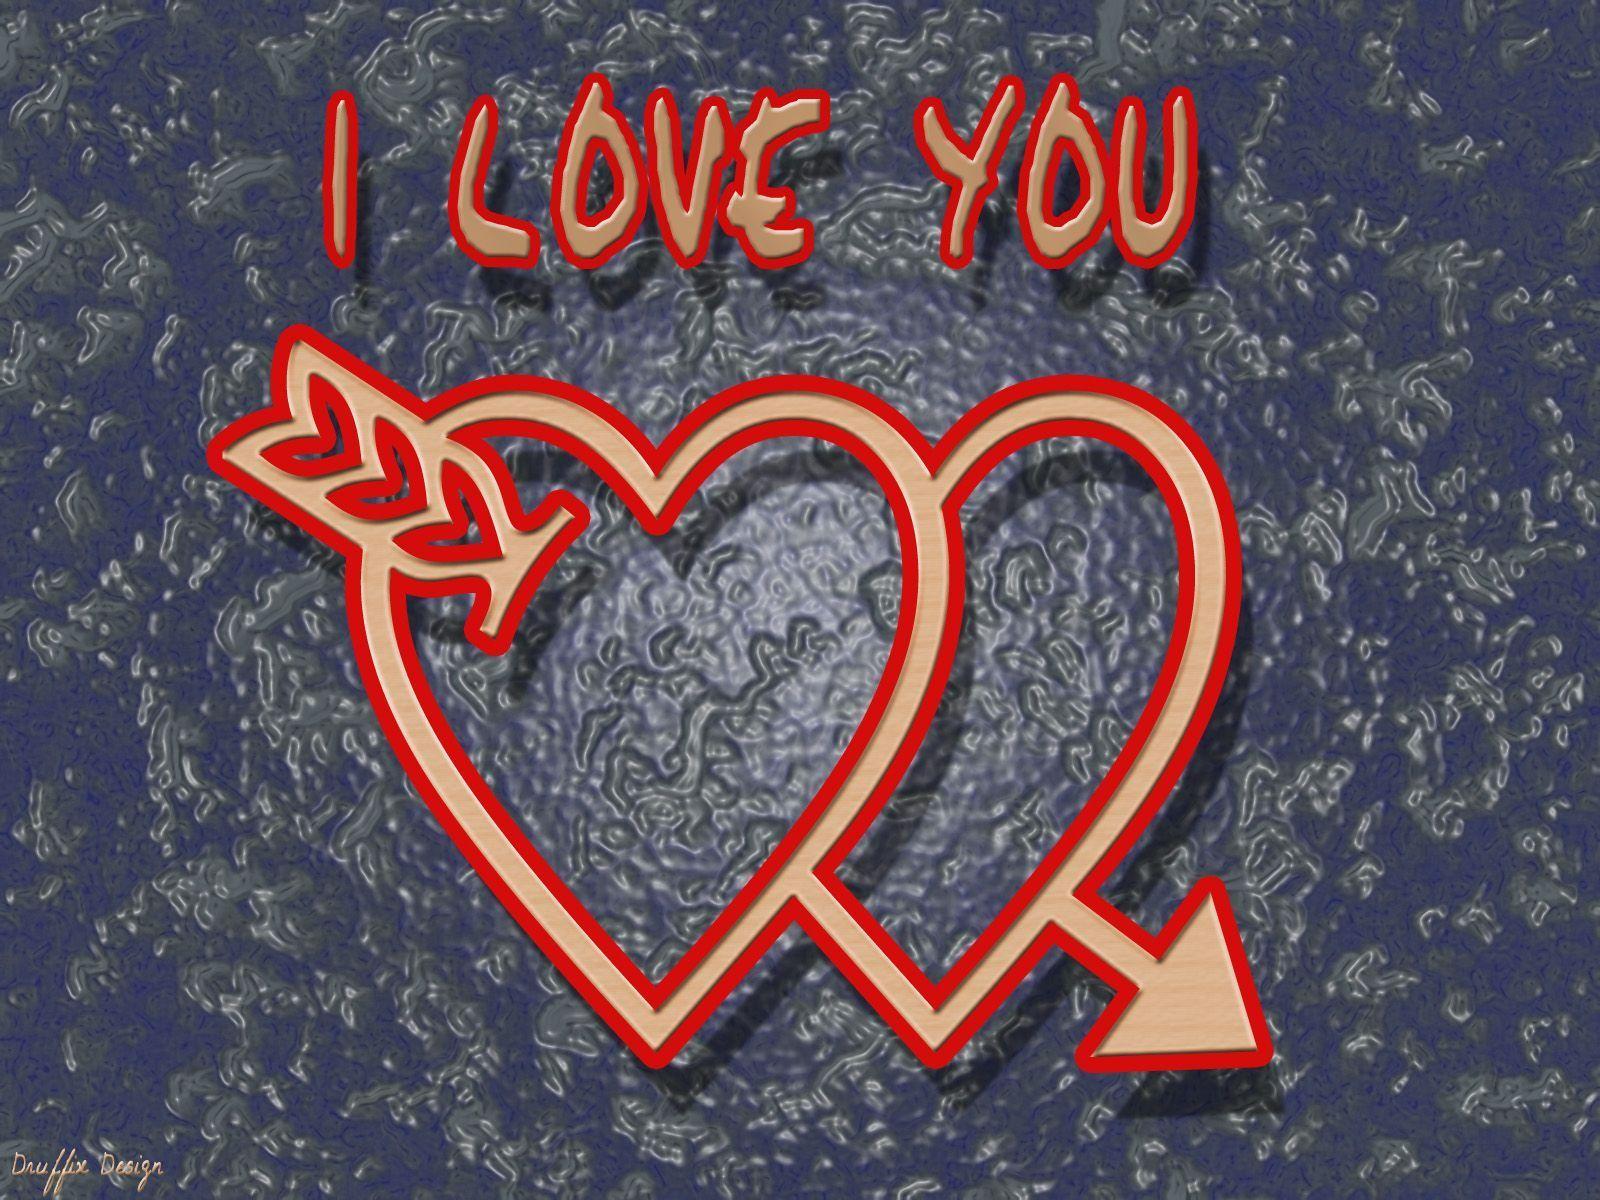 Cool Wallpaper Name Monika - I-LOVE-YOU-love-8964788-1600-1200  Perfect Image Reference_2939.jpg